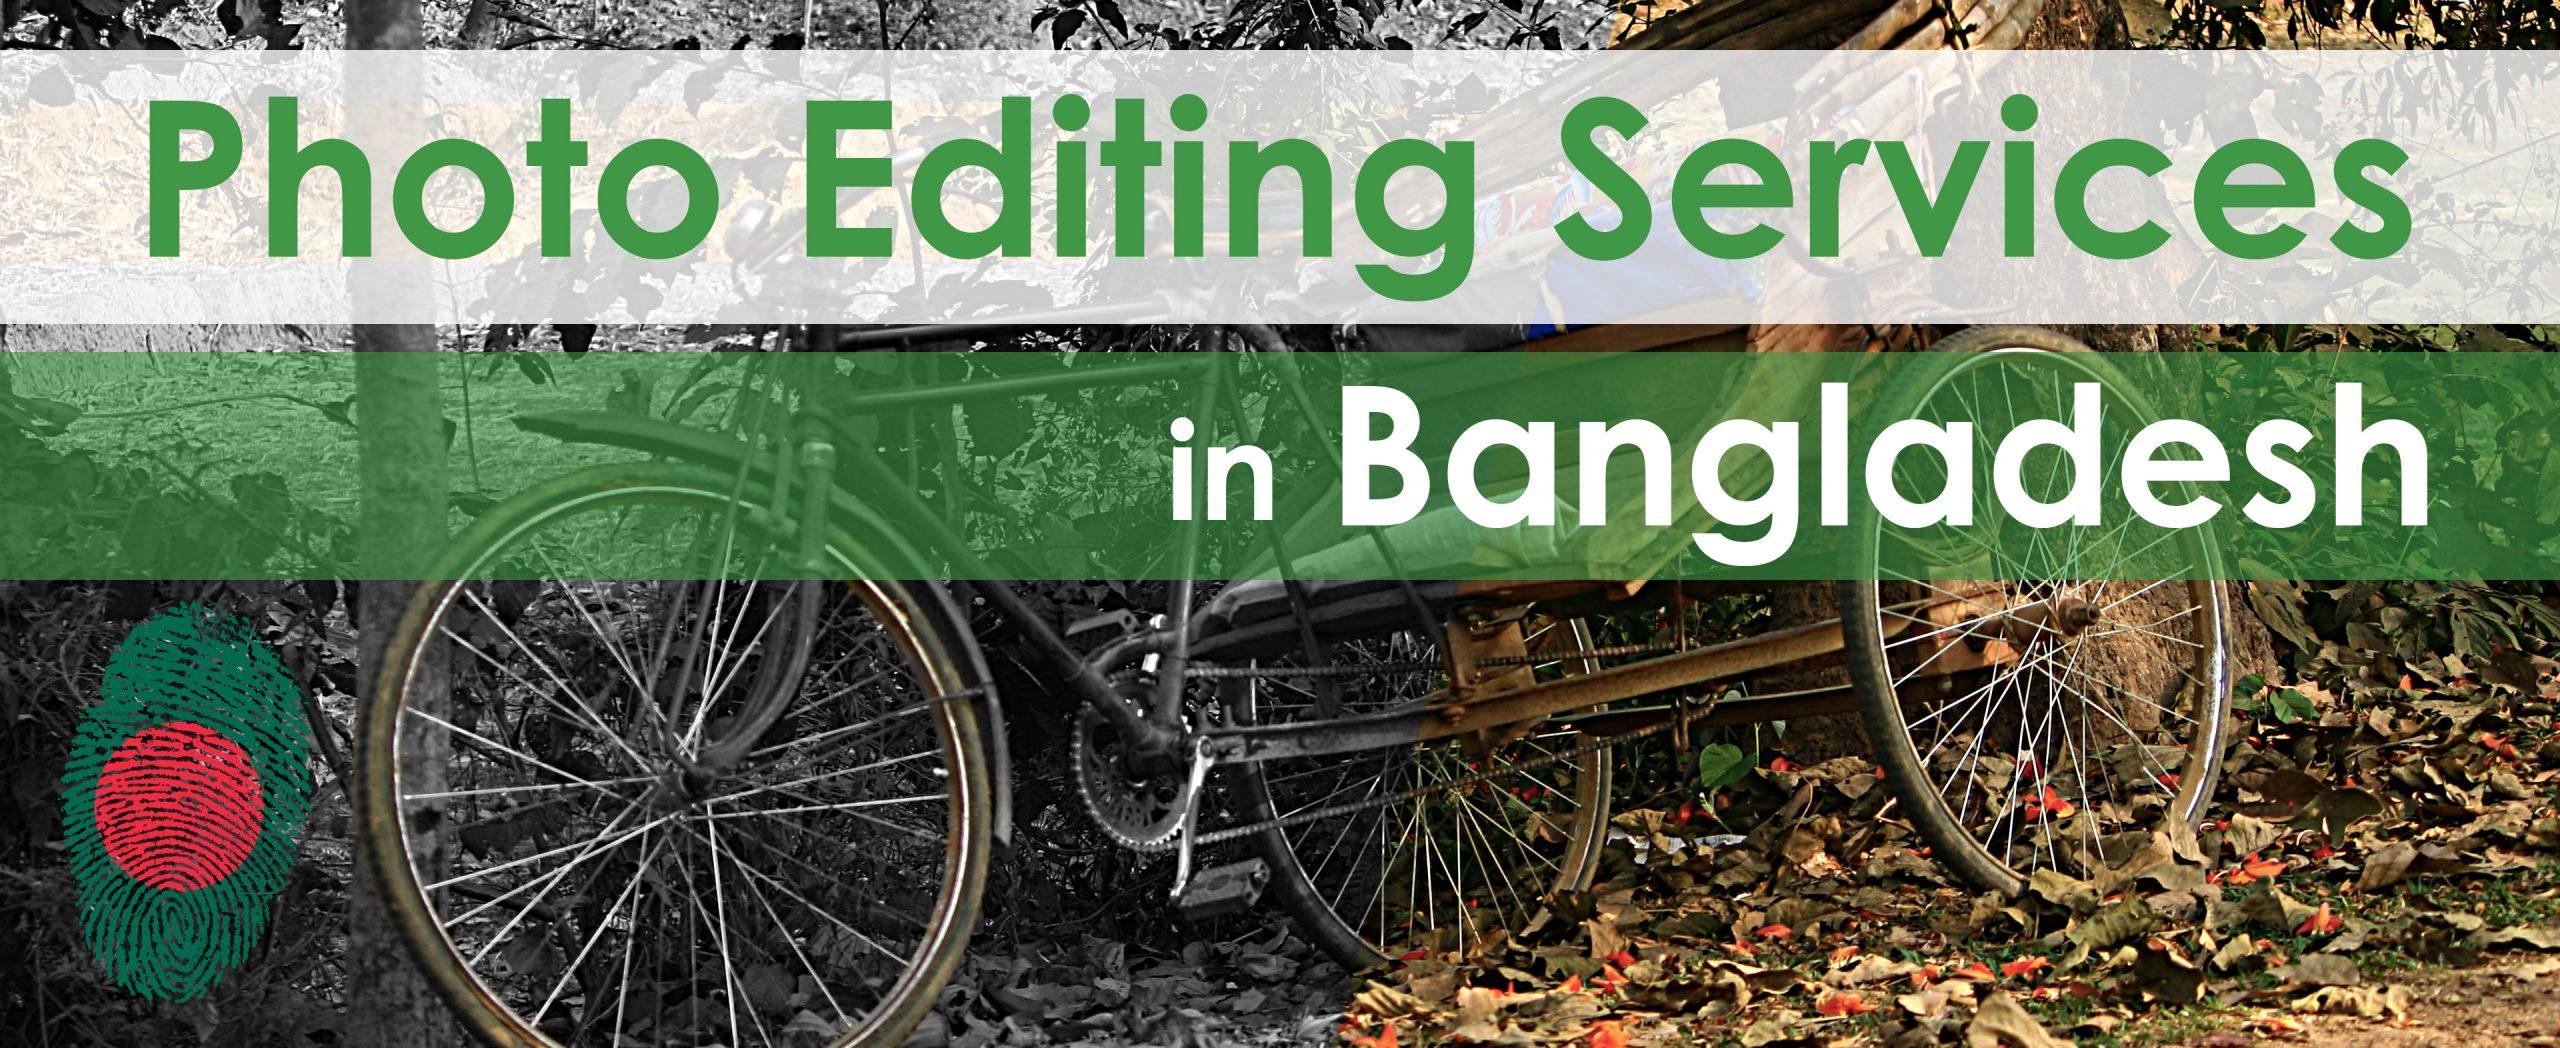 Photo Editing Services in Bangladesh